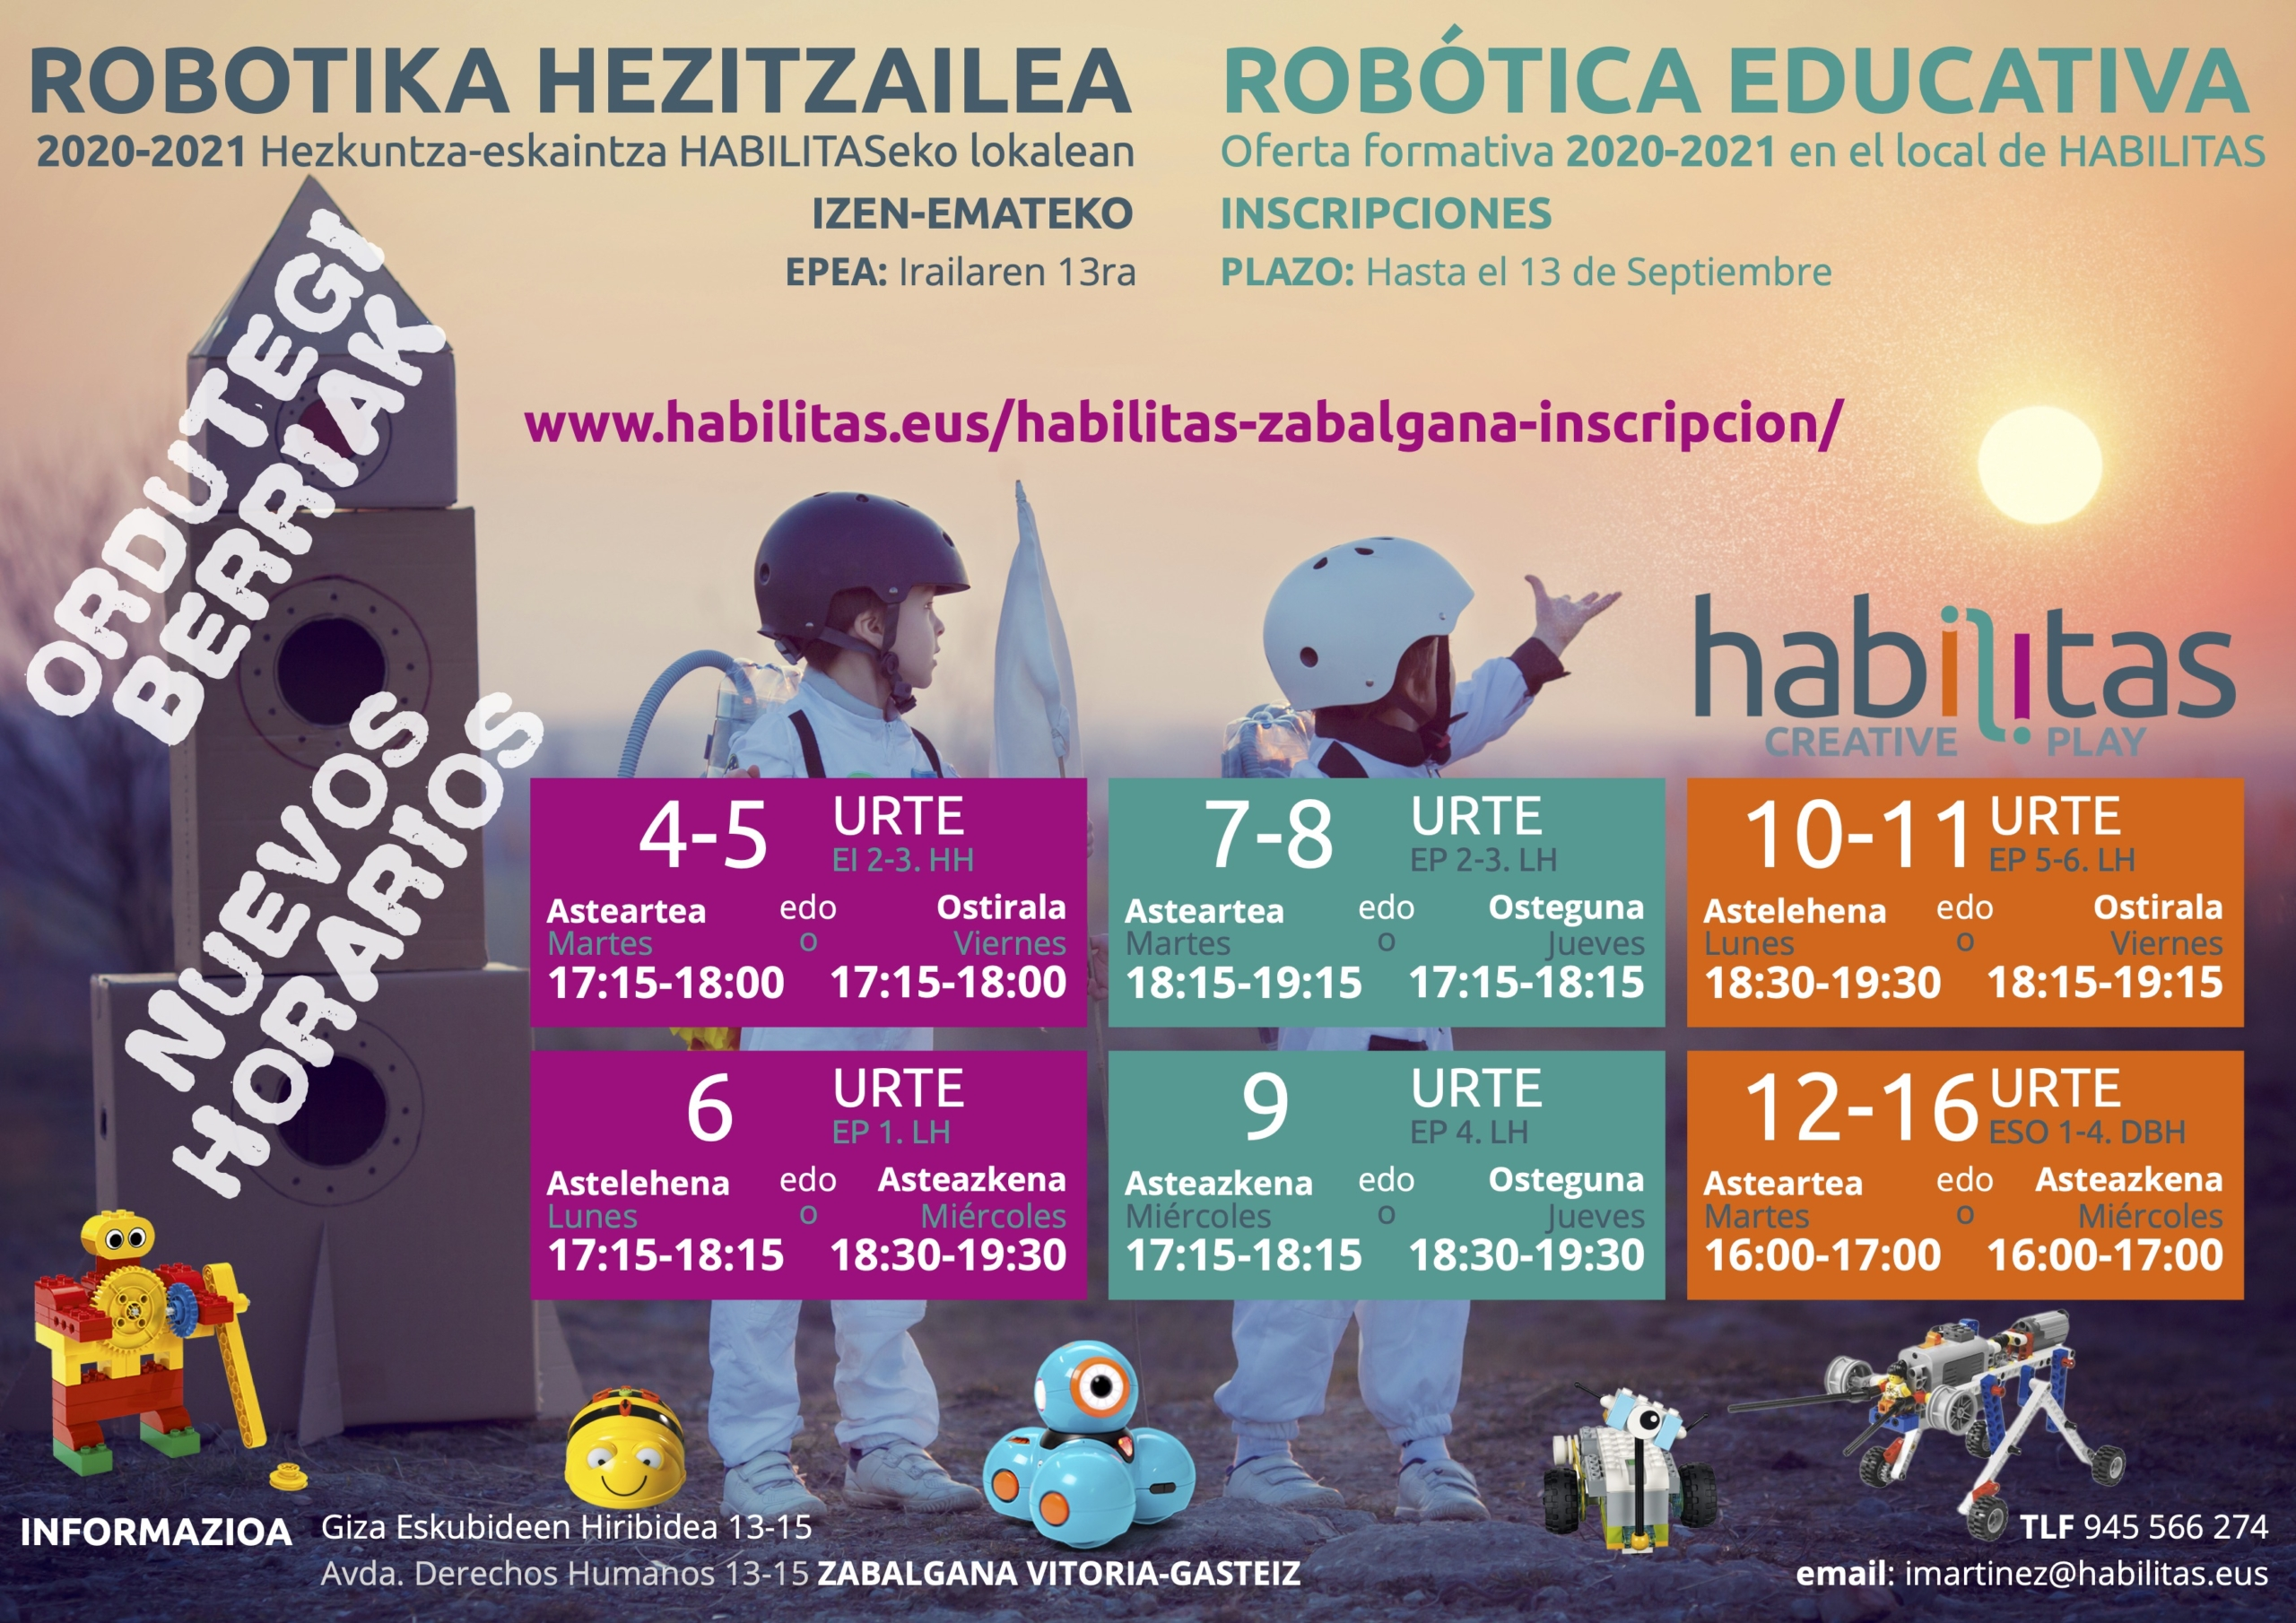 Clases robótica educativa Vitoria-Gasteiz